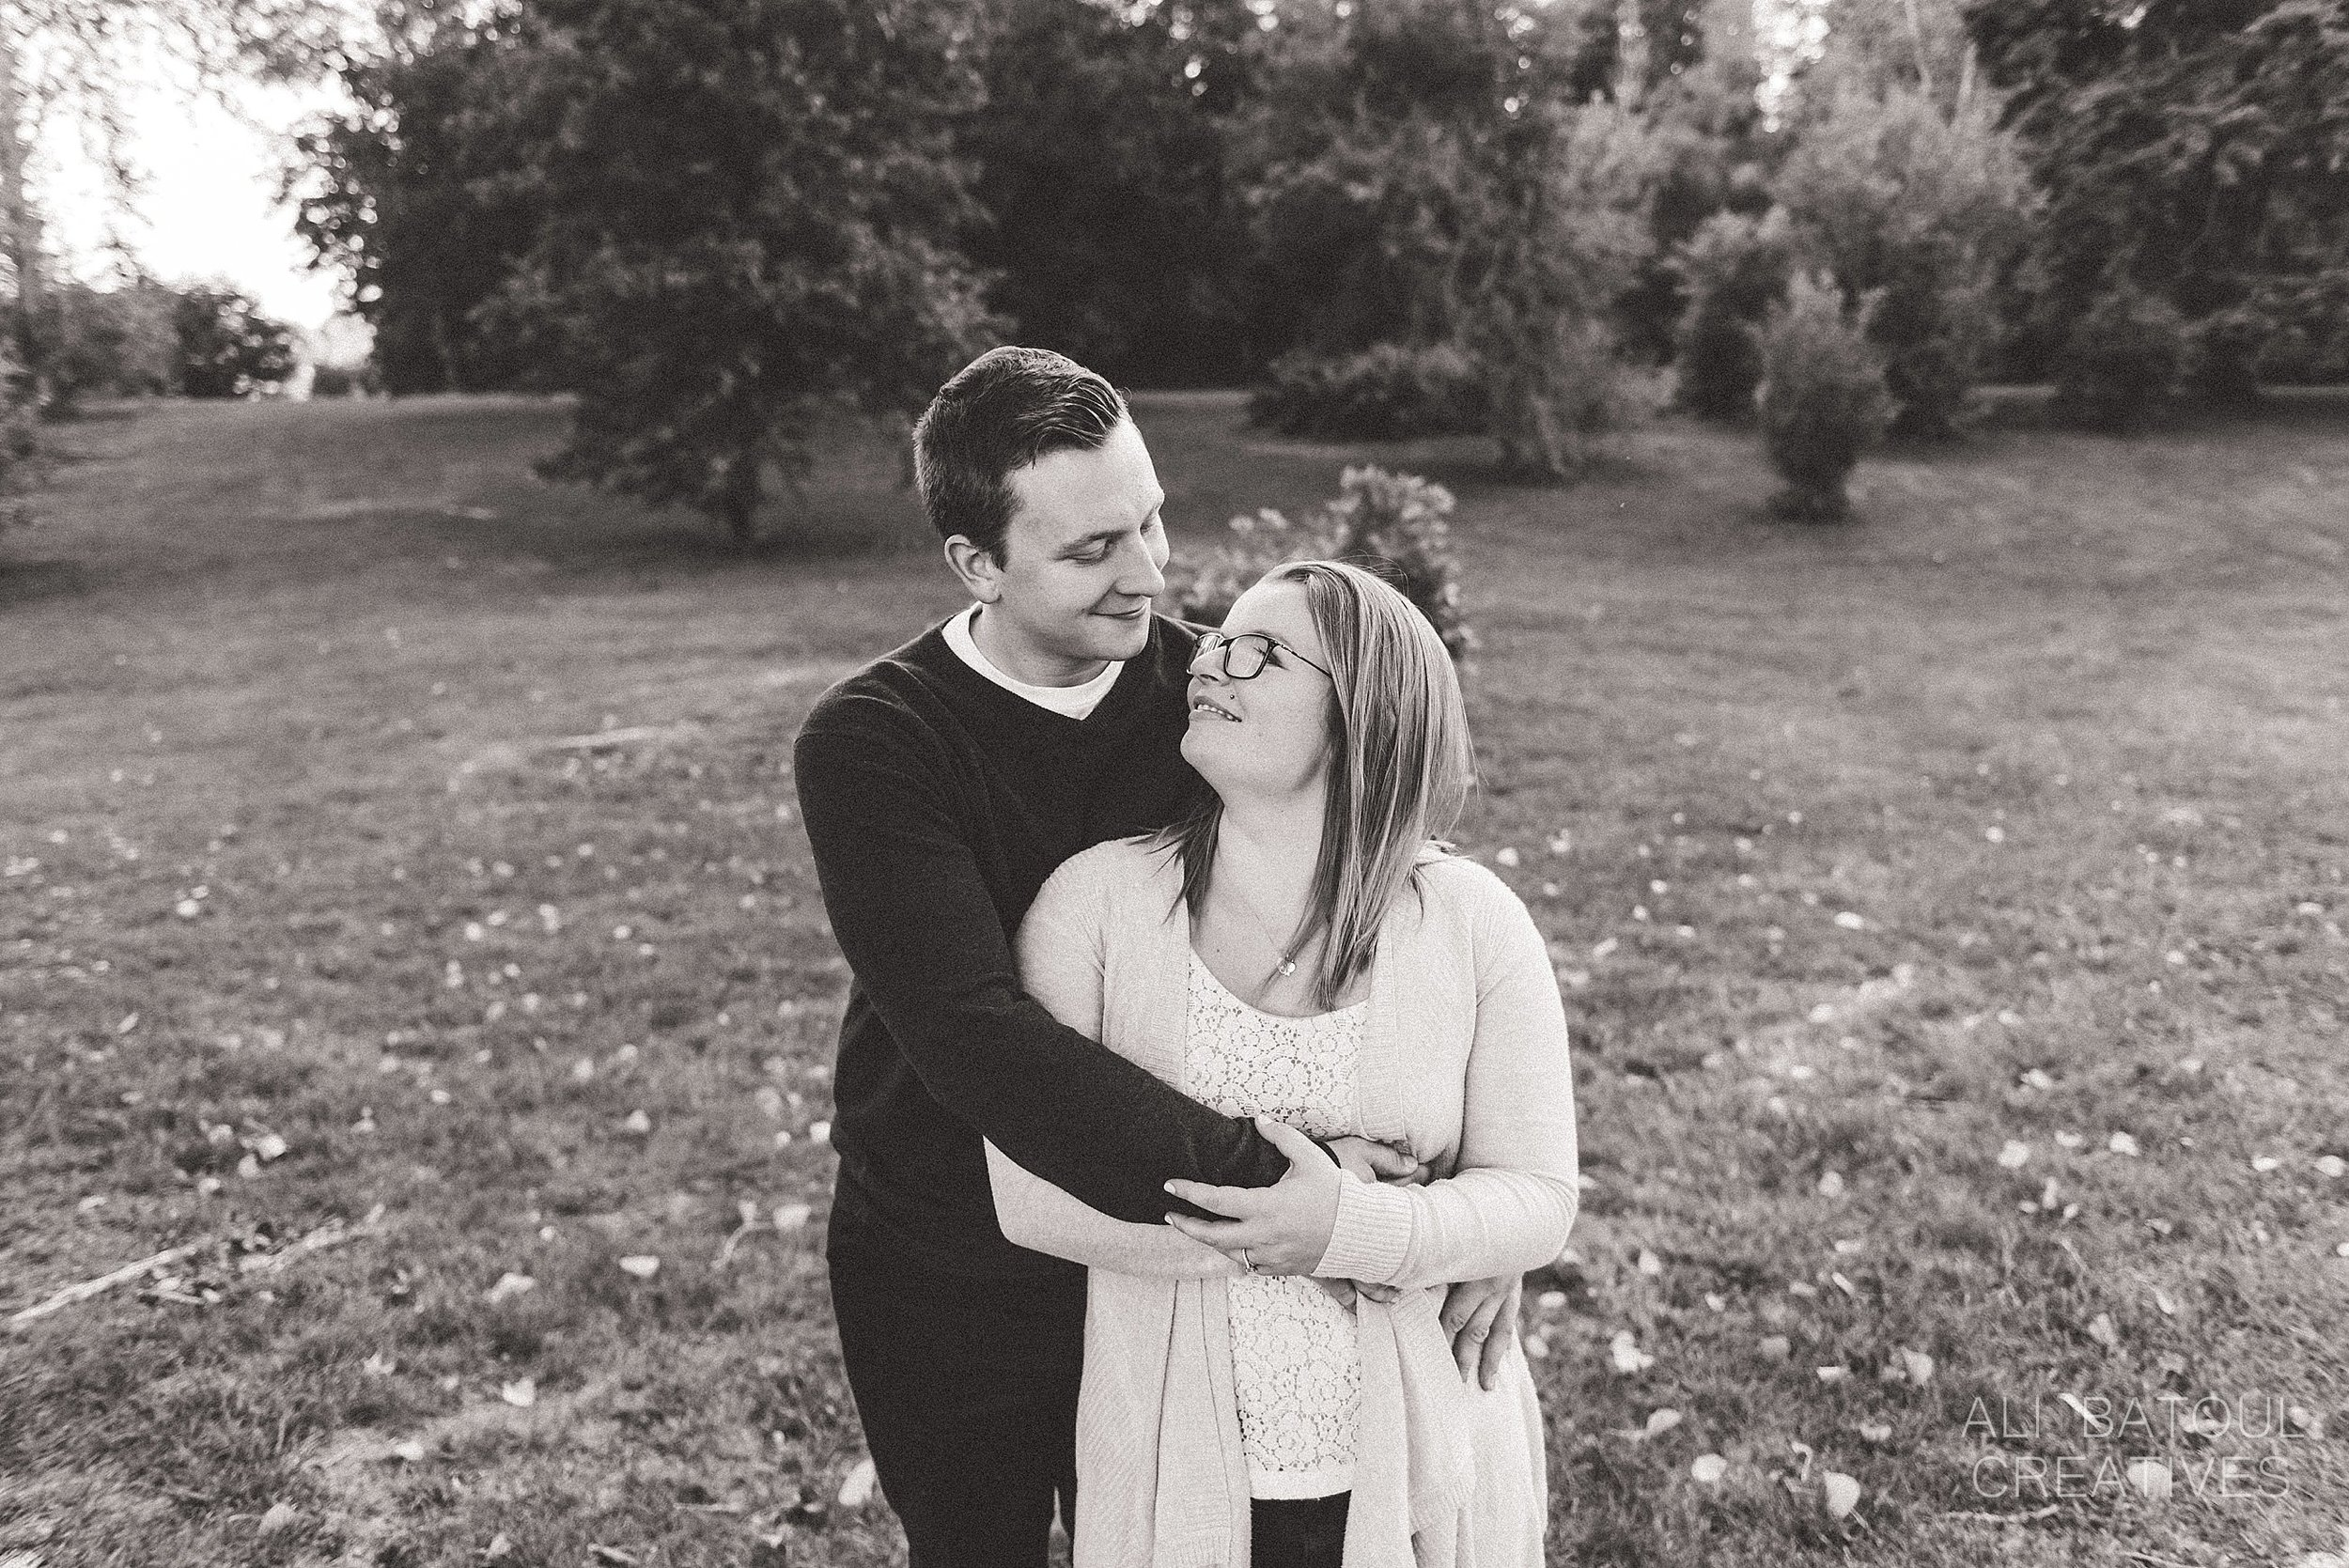 Natasha + Rich Ottawa Arboretum Engagement Photos - Ali and Batoul Fine Art Wedding Photography_0024.jpg